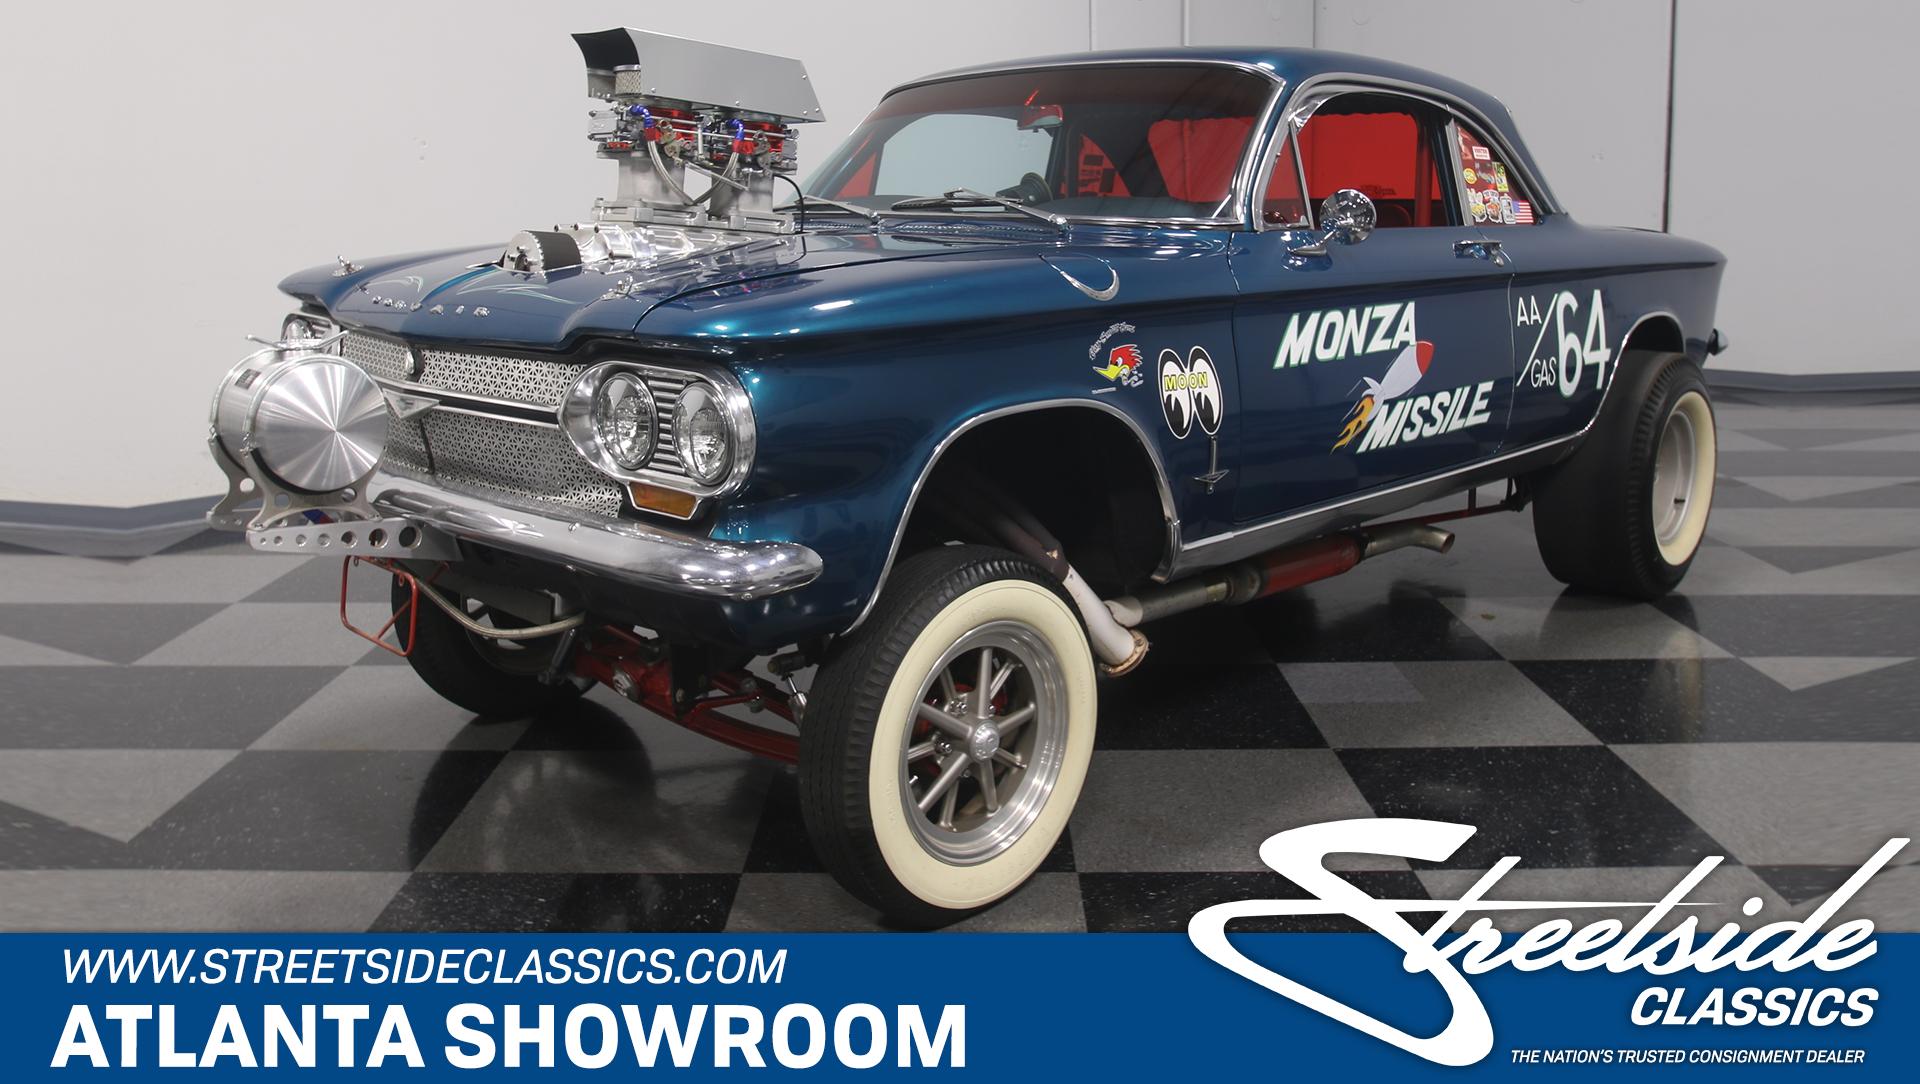 1964 Chevrolet Corvair Monza Gasser for sale #63153   MCG